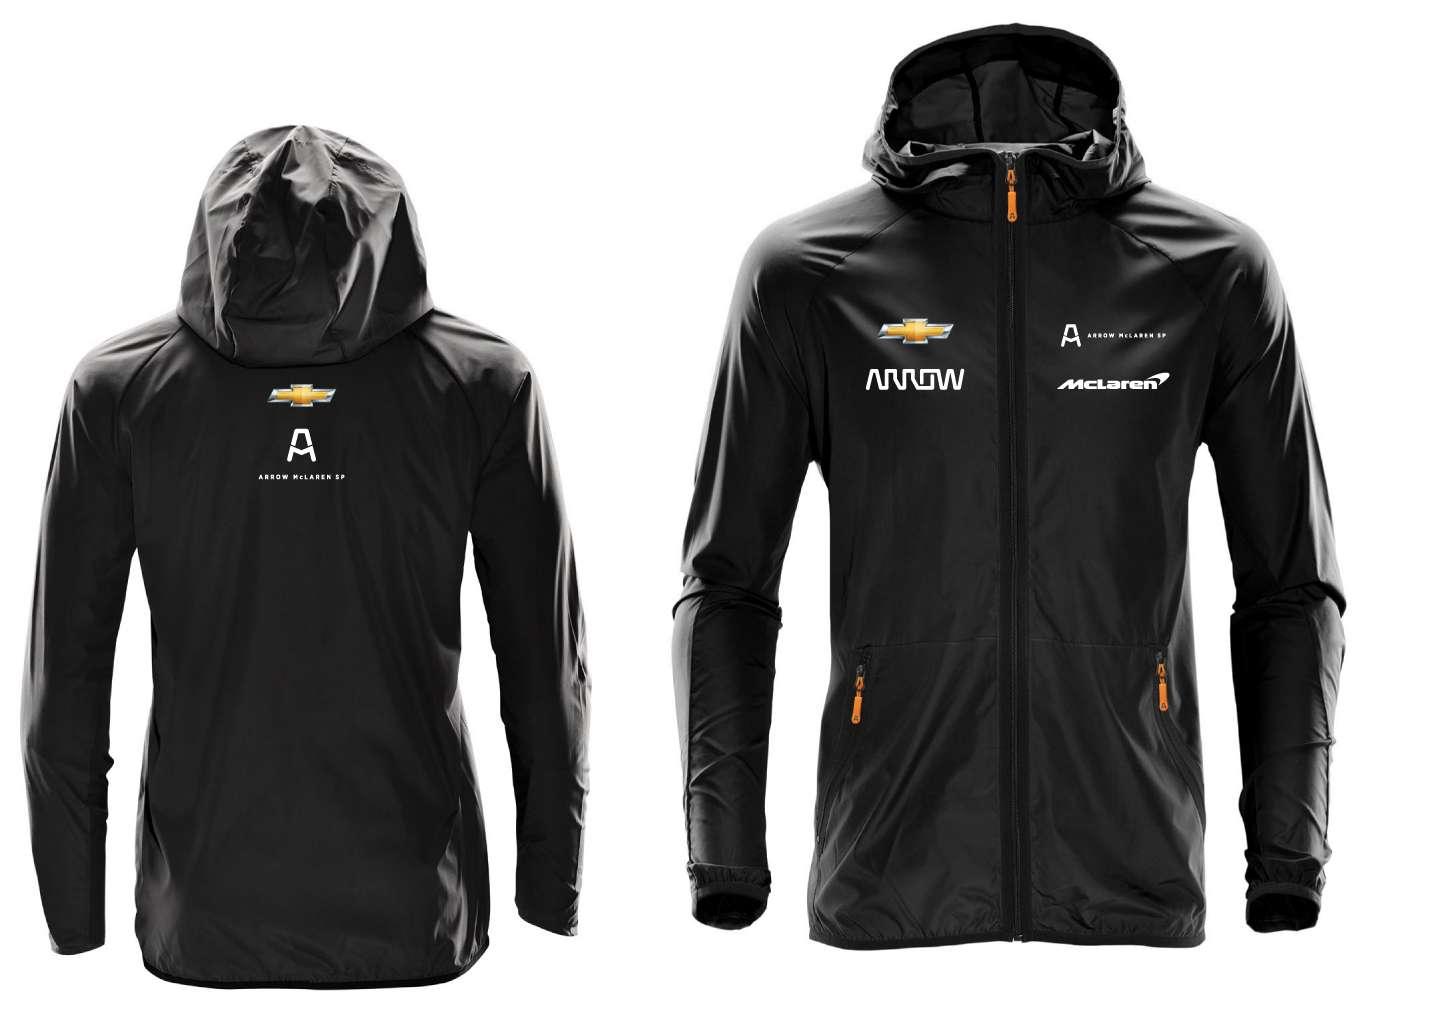 4XL Men's Official Team Rain Jacket